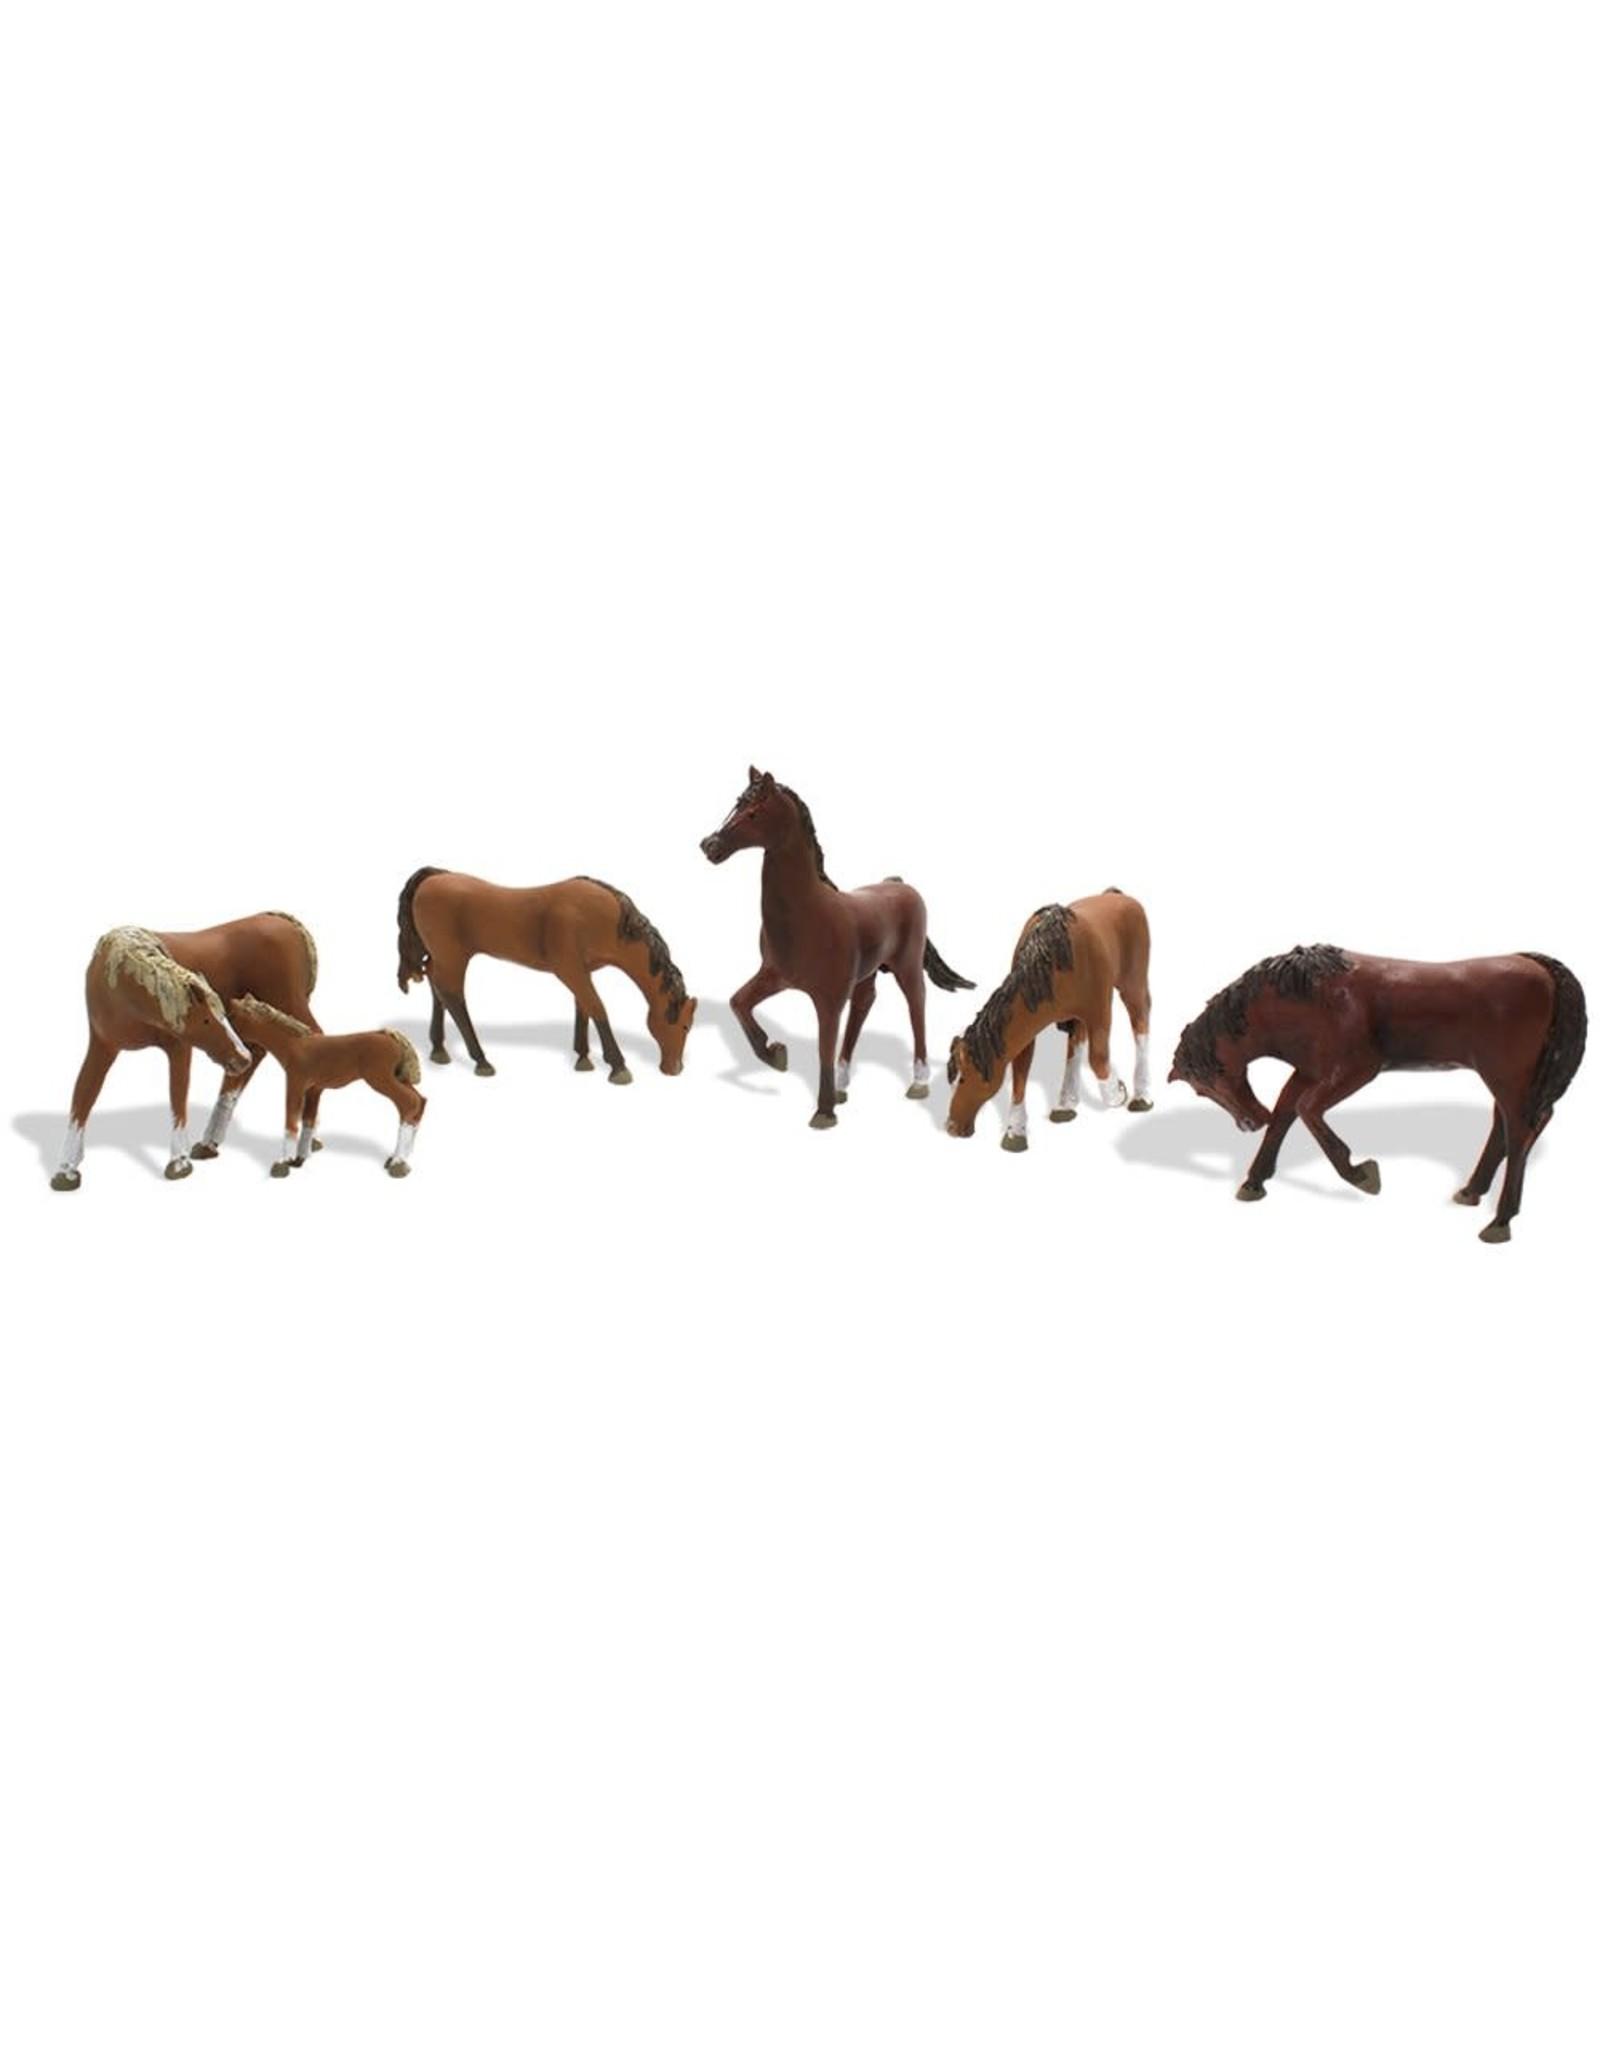 Woodland Scenics Chestnut Horses HO 1842